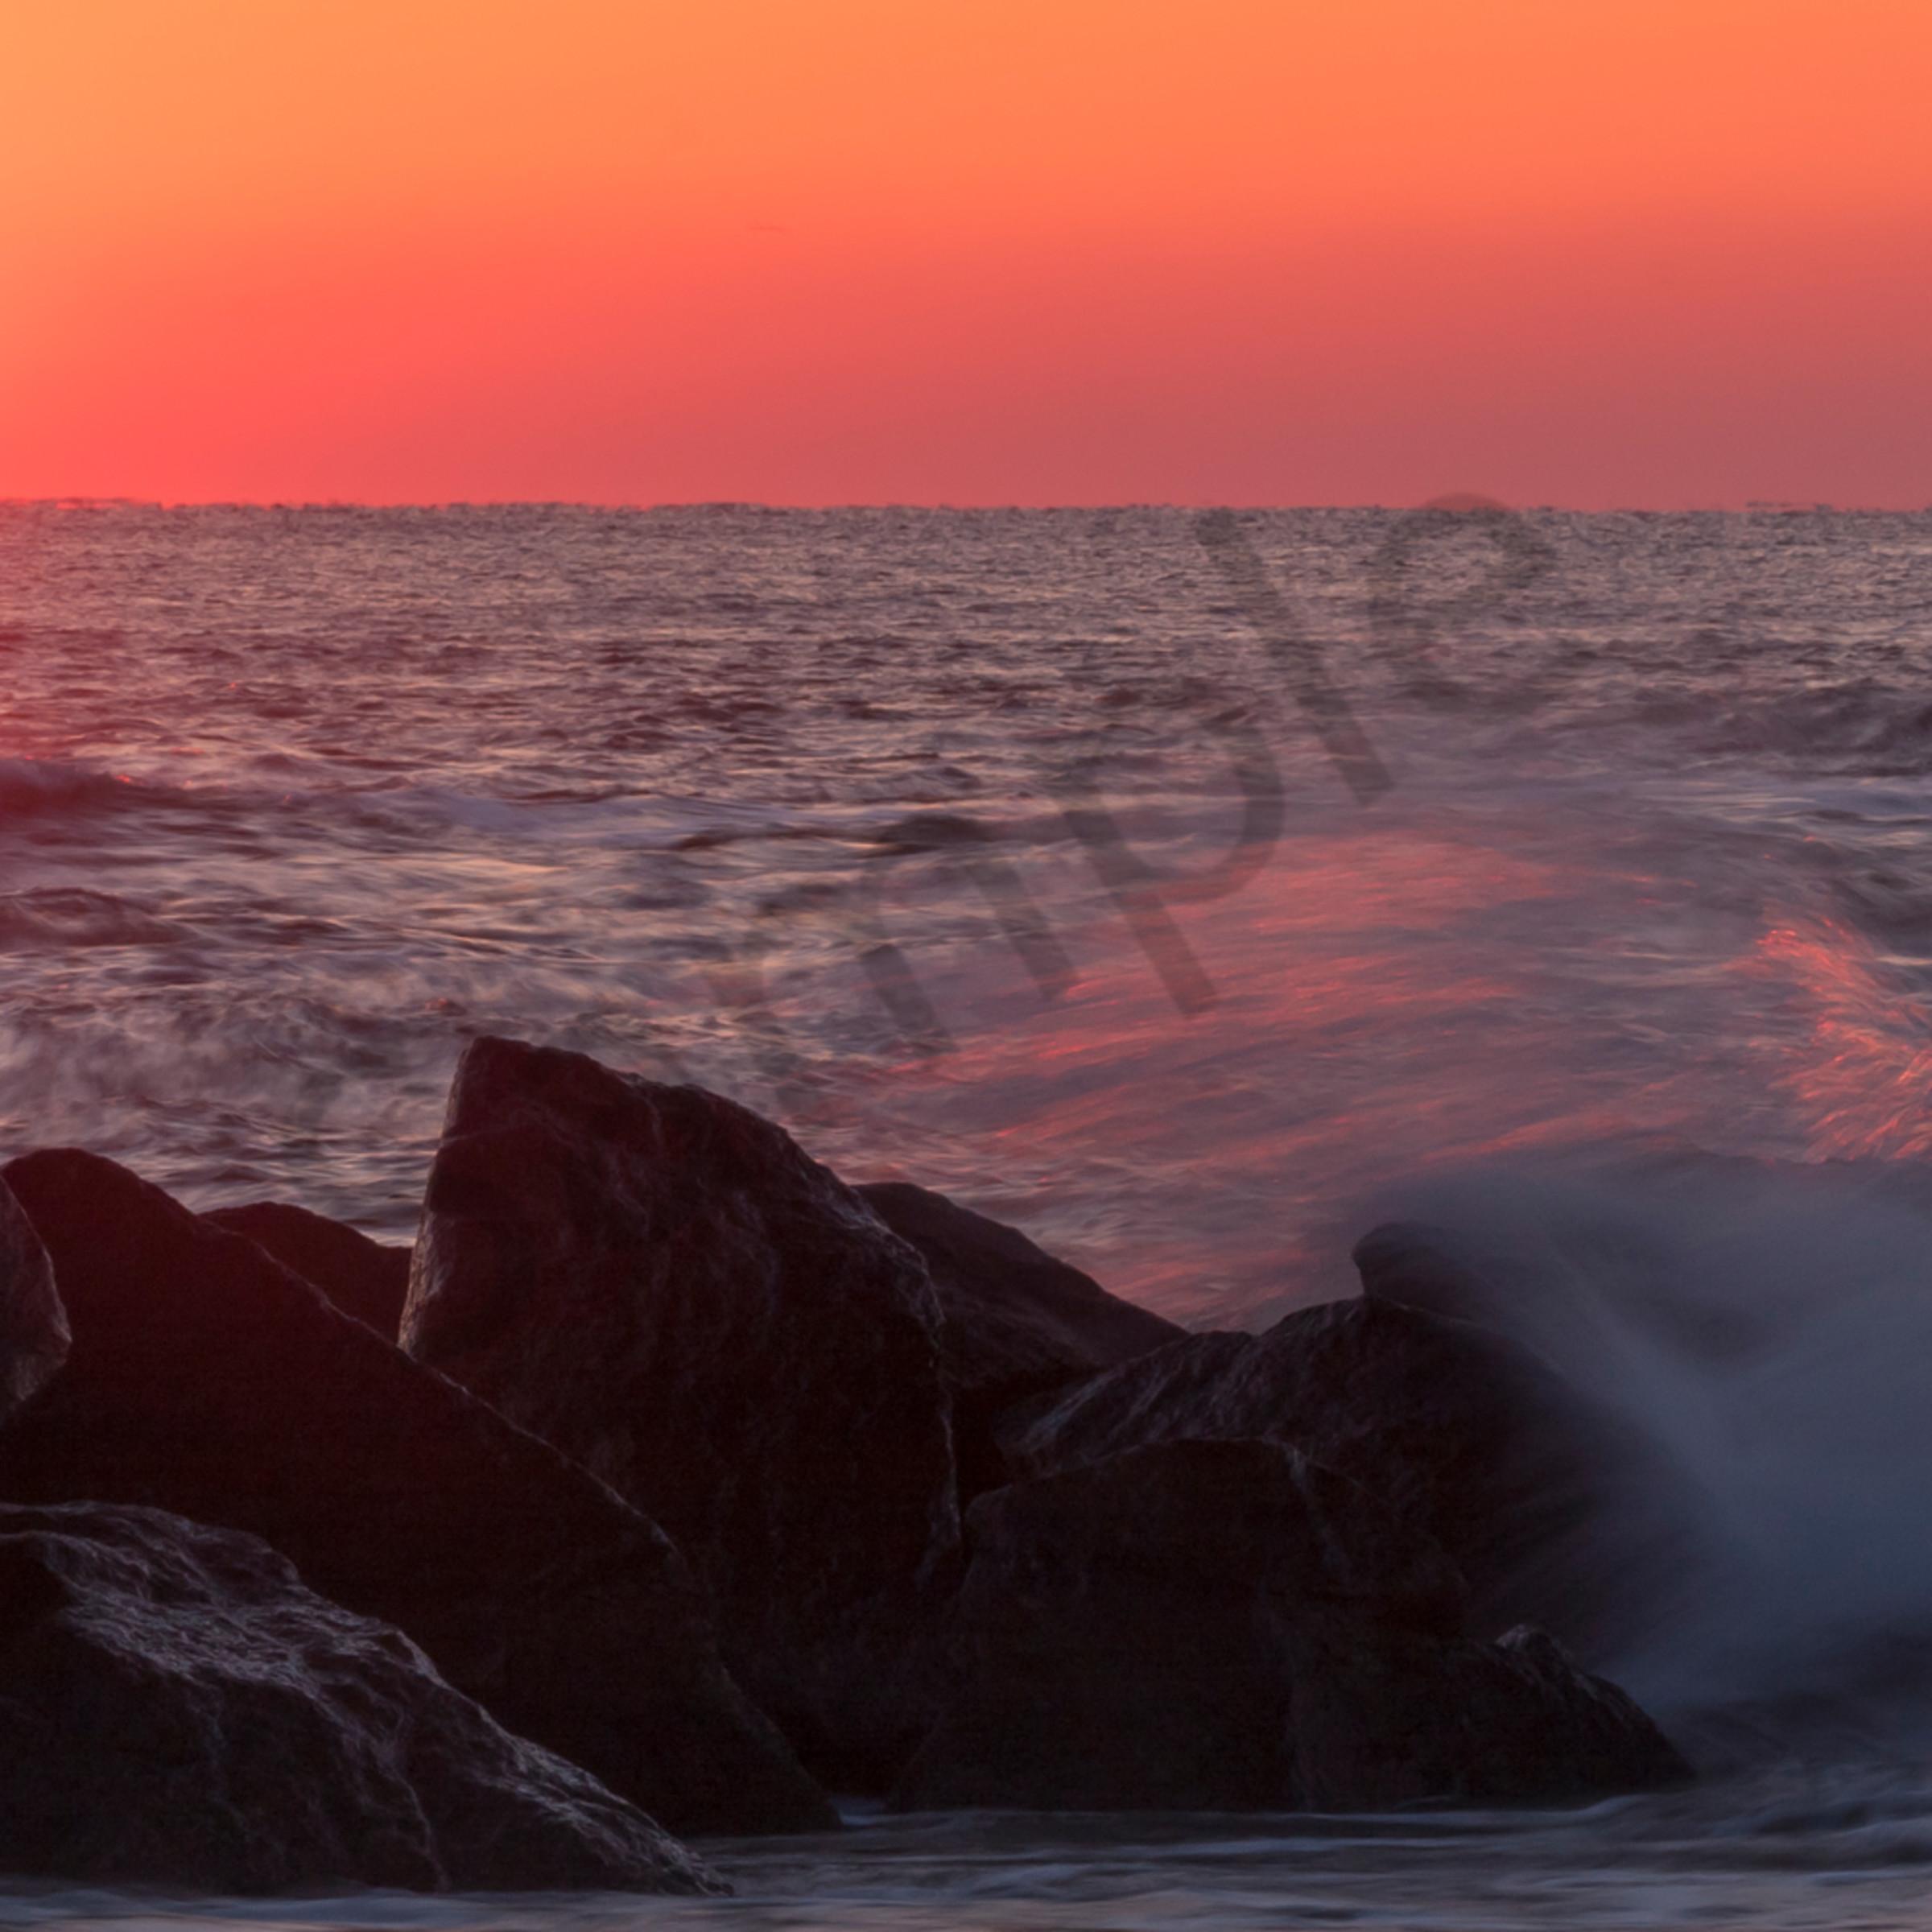 Sea wall sunrise 2 c v1yckz